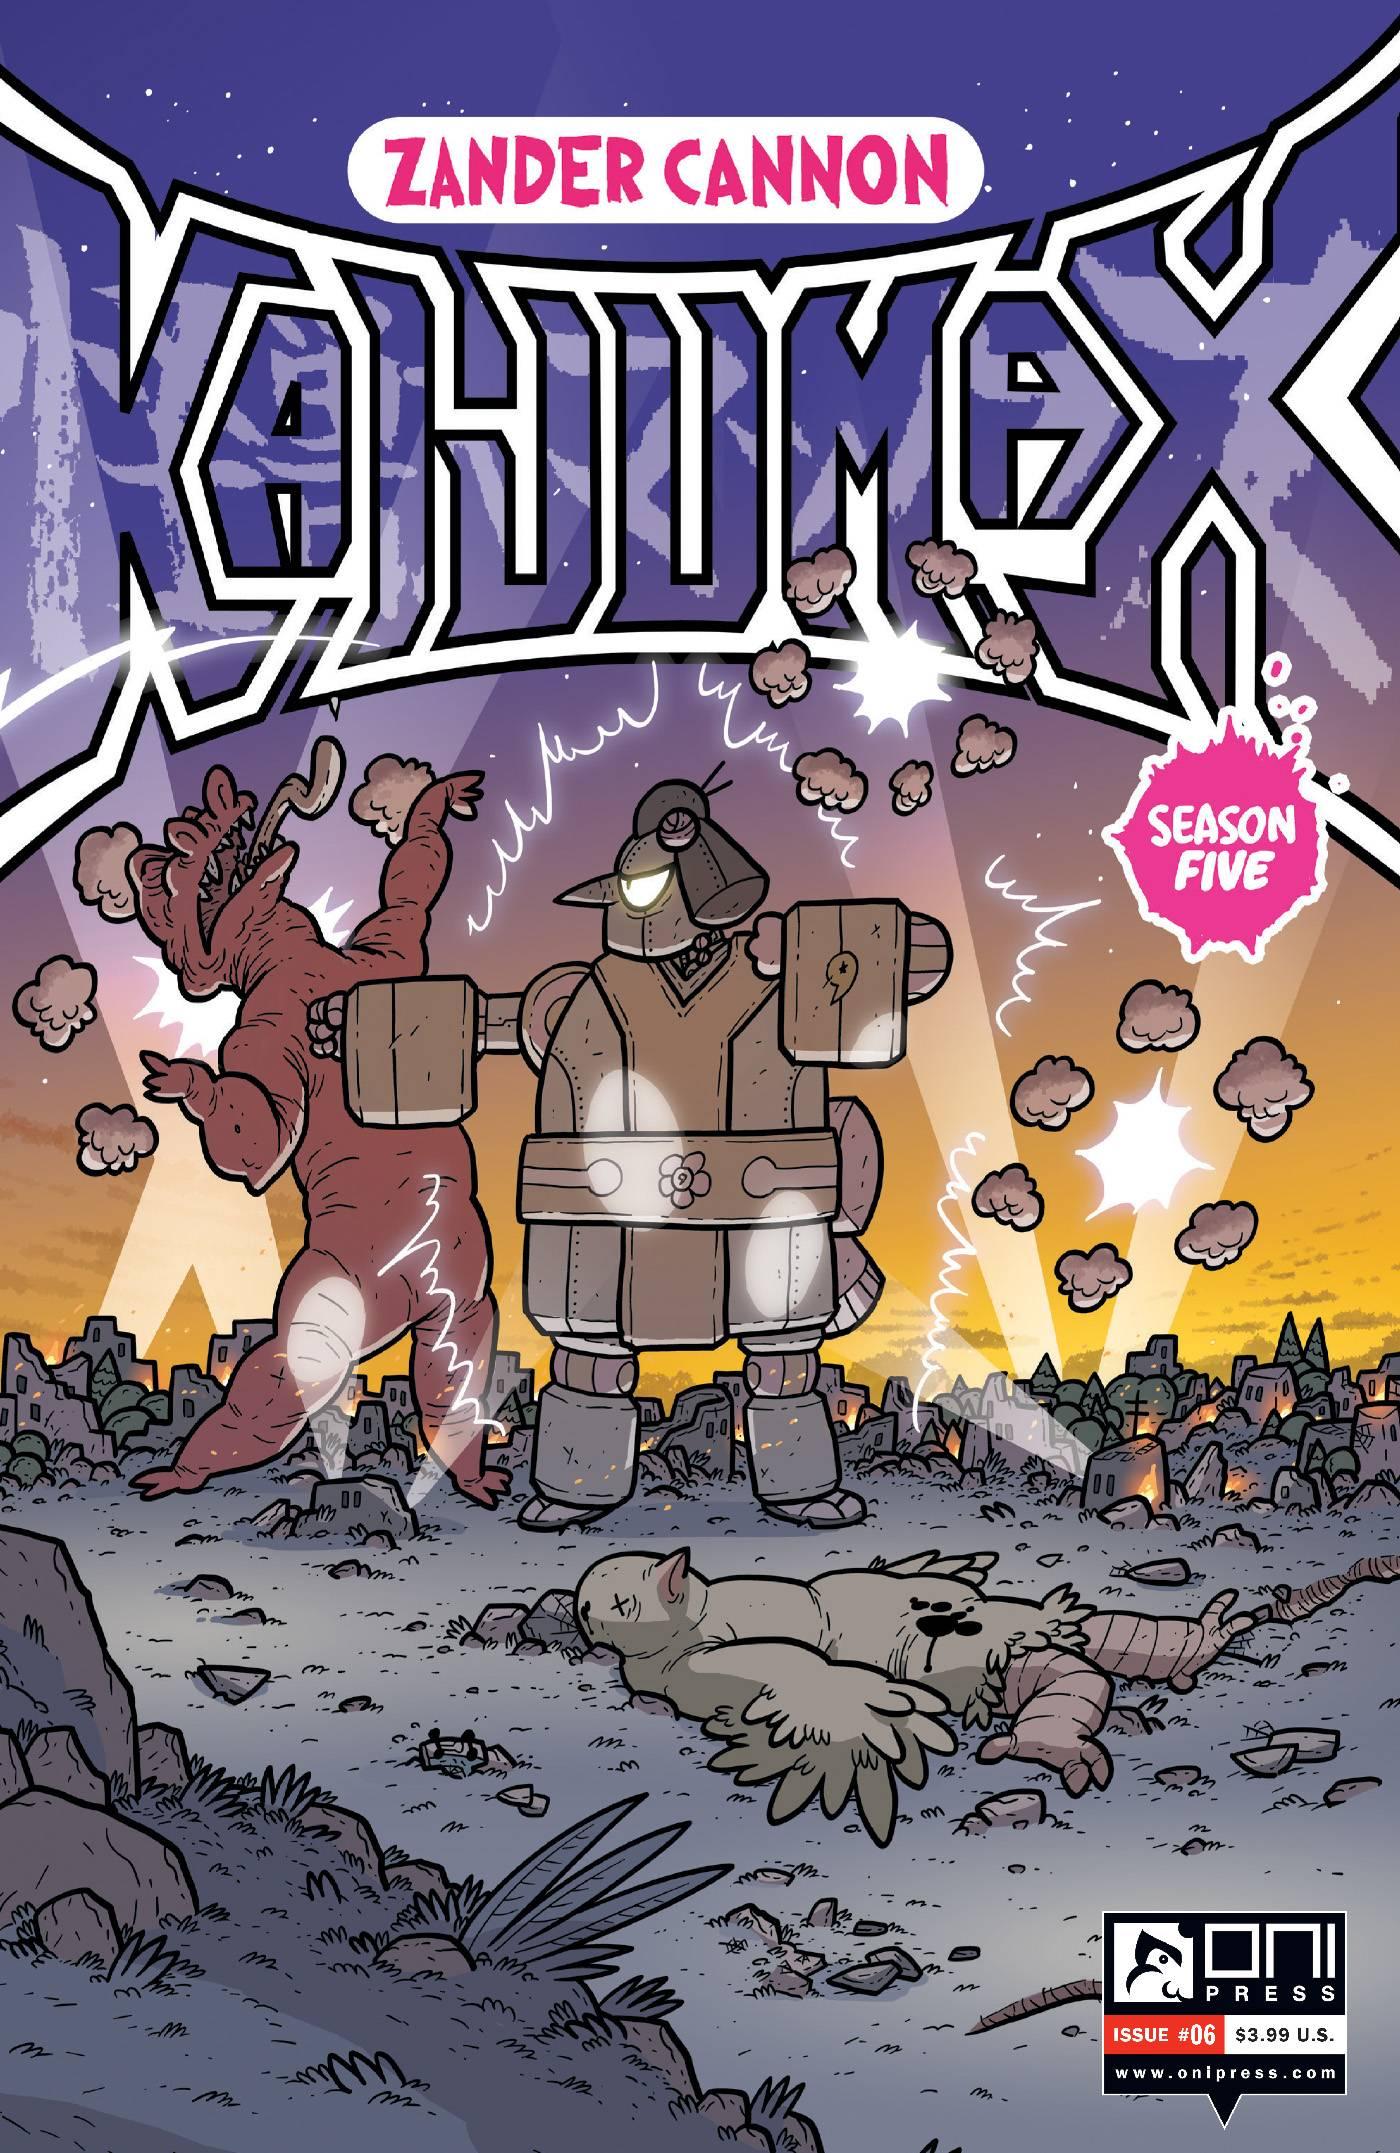 Kaijumax Season 5 #6 (2021)